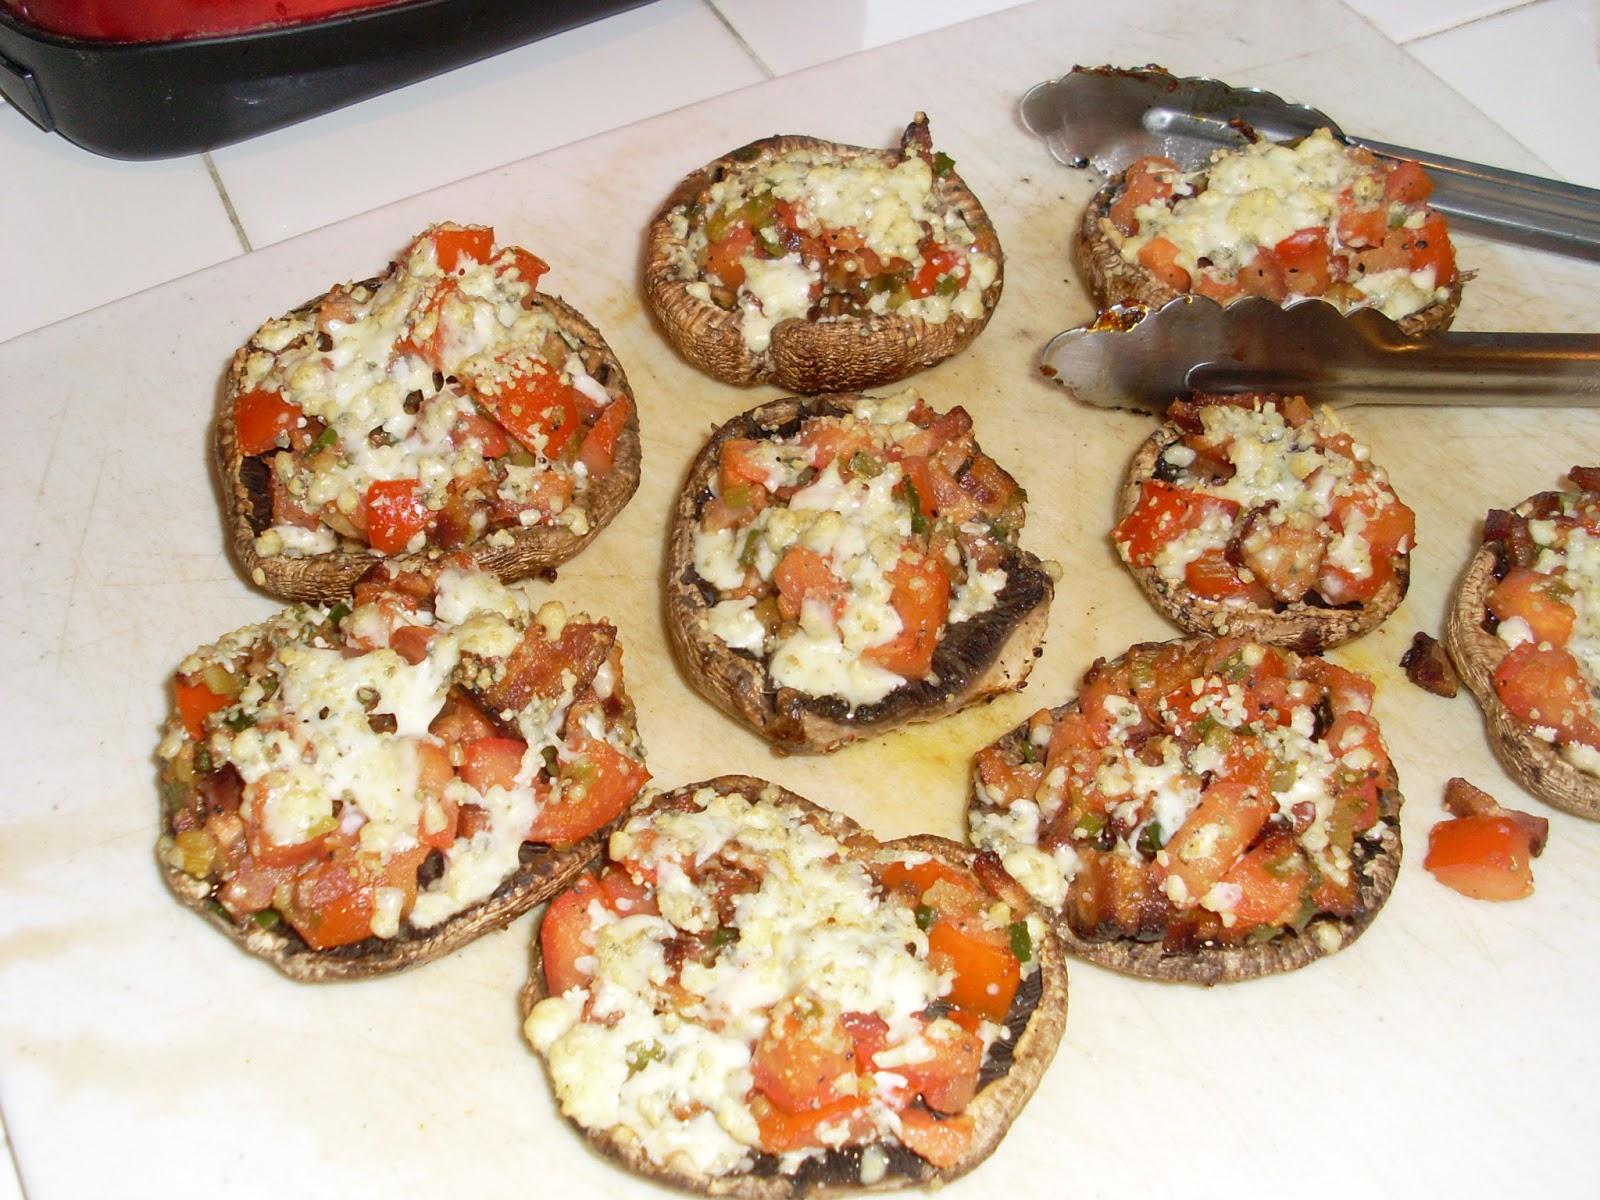 Meat Incorporated: Stuffed Portobello Mushrooms